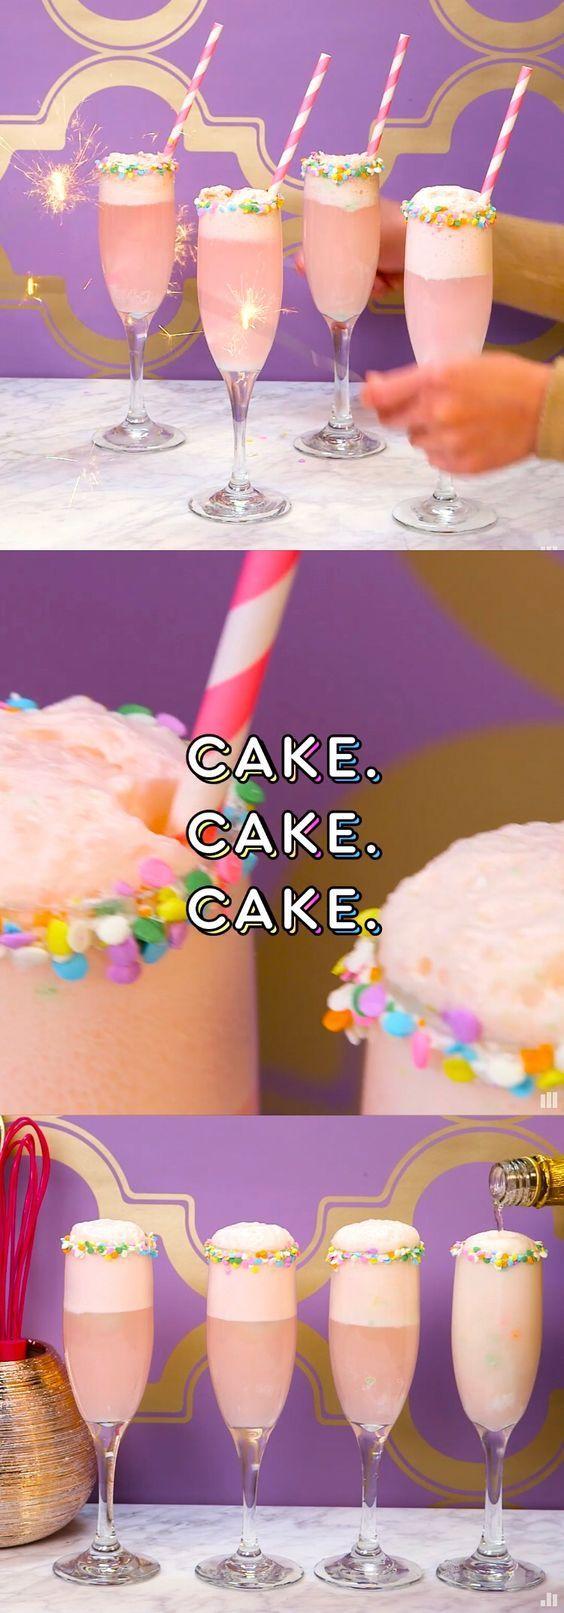 birthday cake mimosas: birthday cake vodka + birthday cake ice cream + champagne with a frosting & sprinkles rim